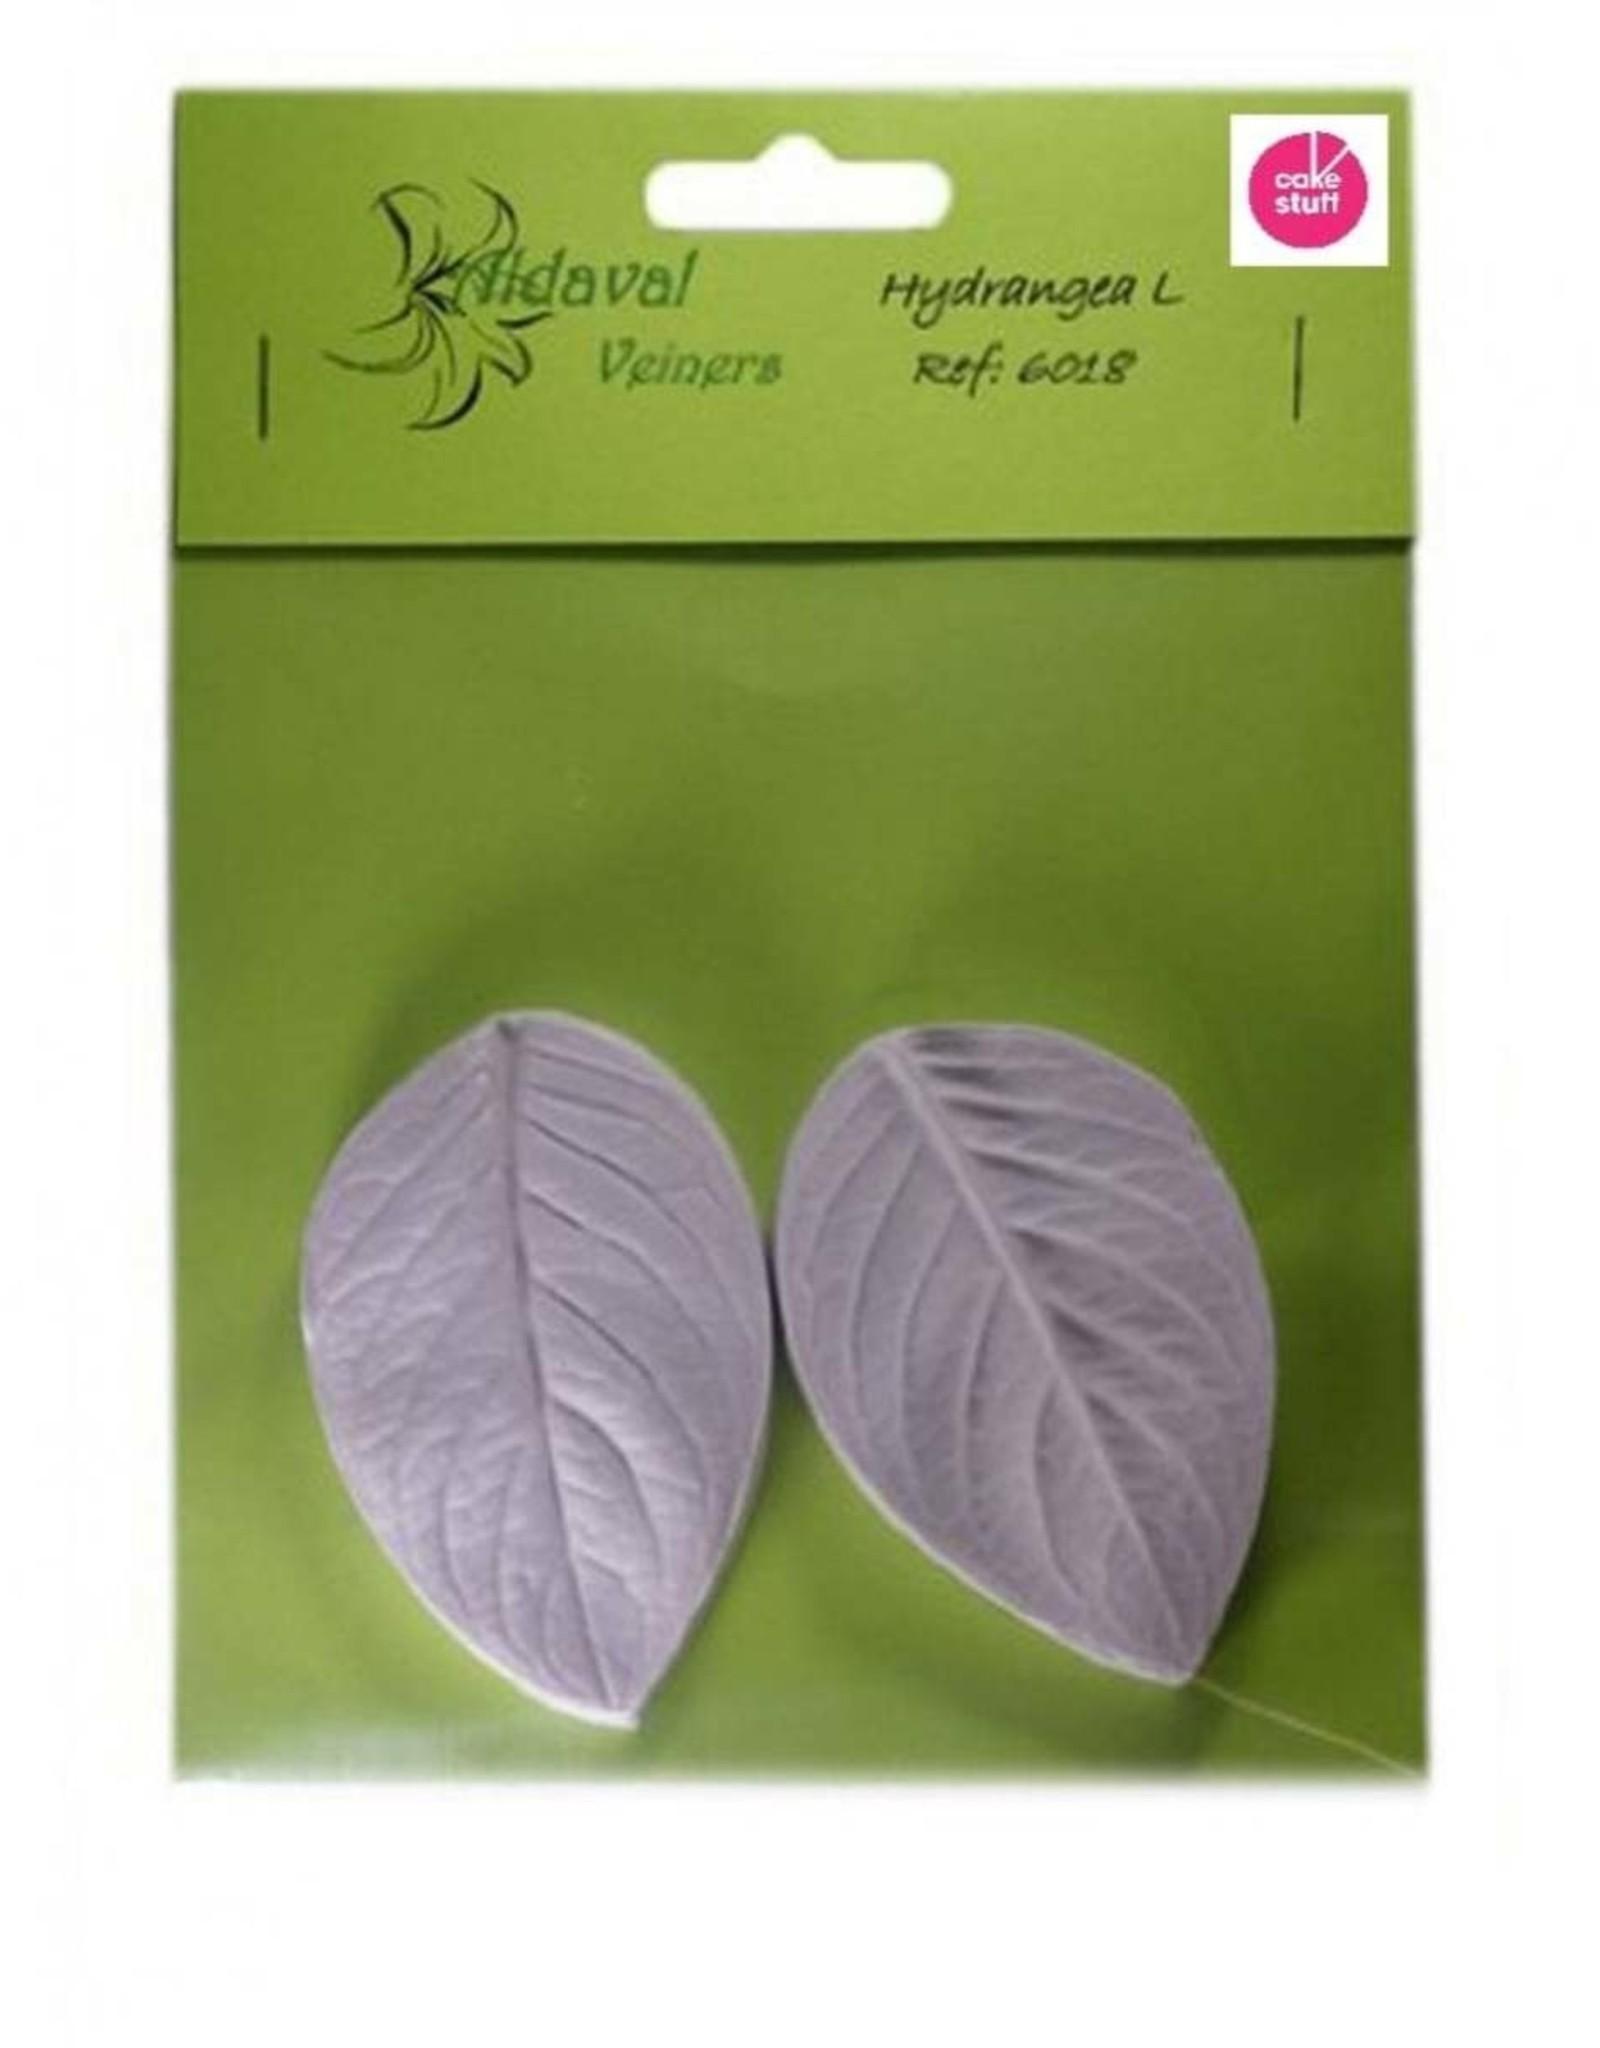 Aldaval Veiners Aldaval Hydrangea Leaf Veiner Large 8cm